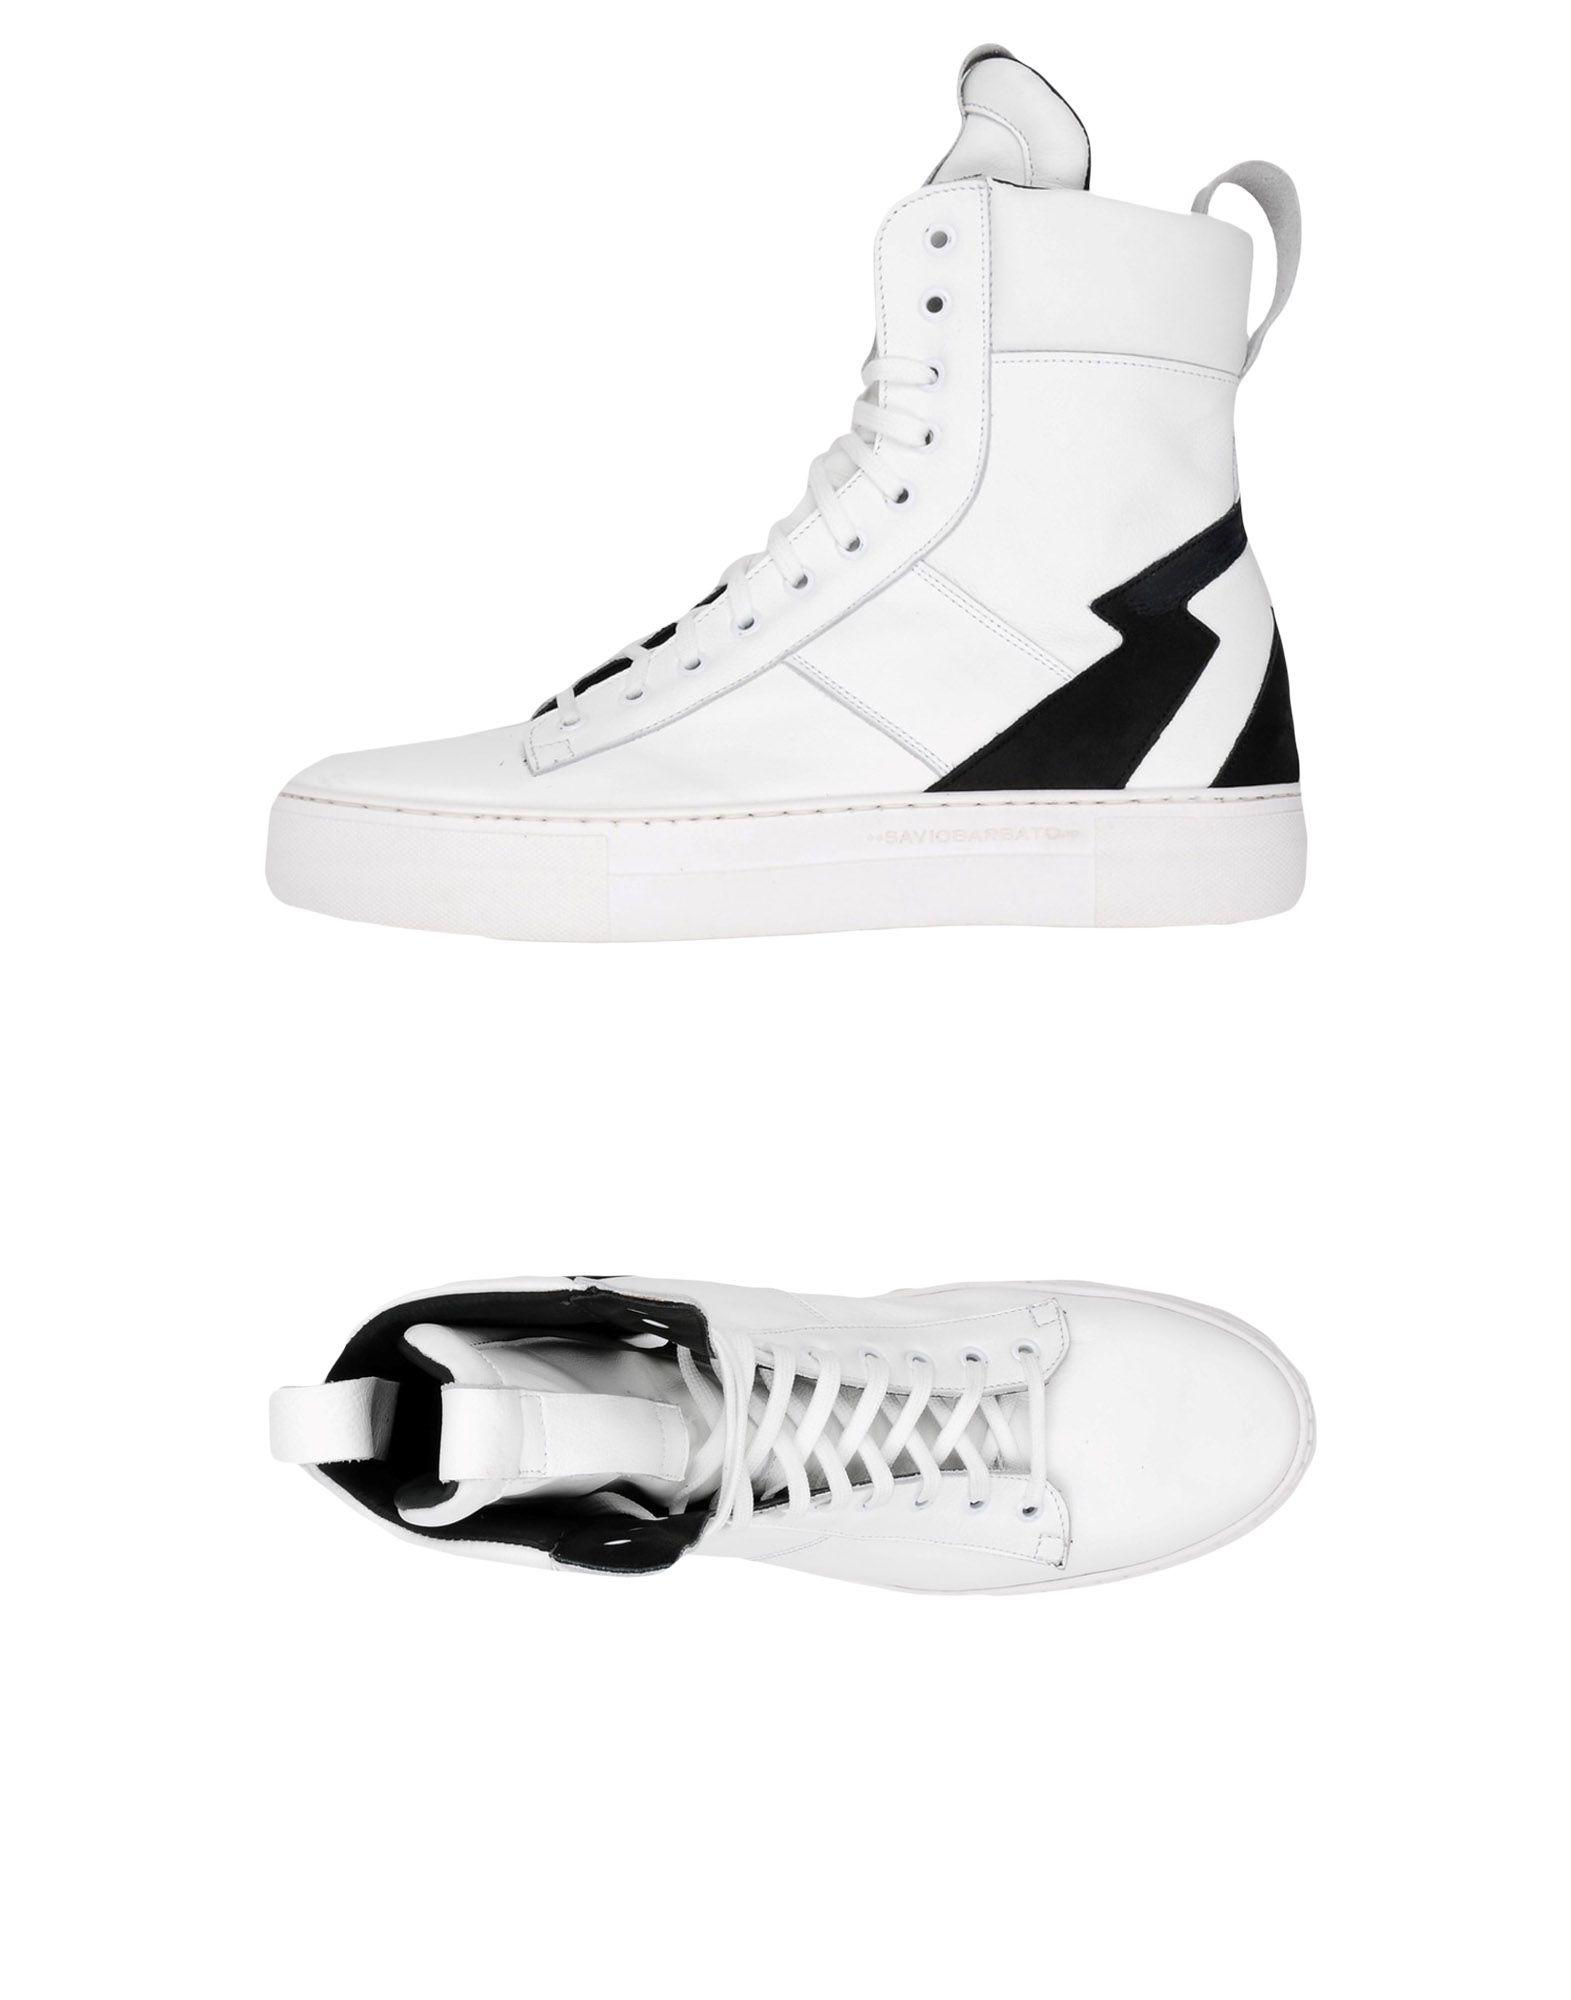 Sneakers Savio Barbato Homme - Sneakers Savio Barbato  Blanc Super rabais